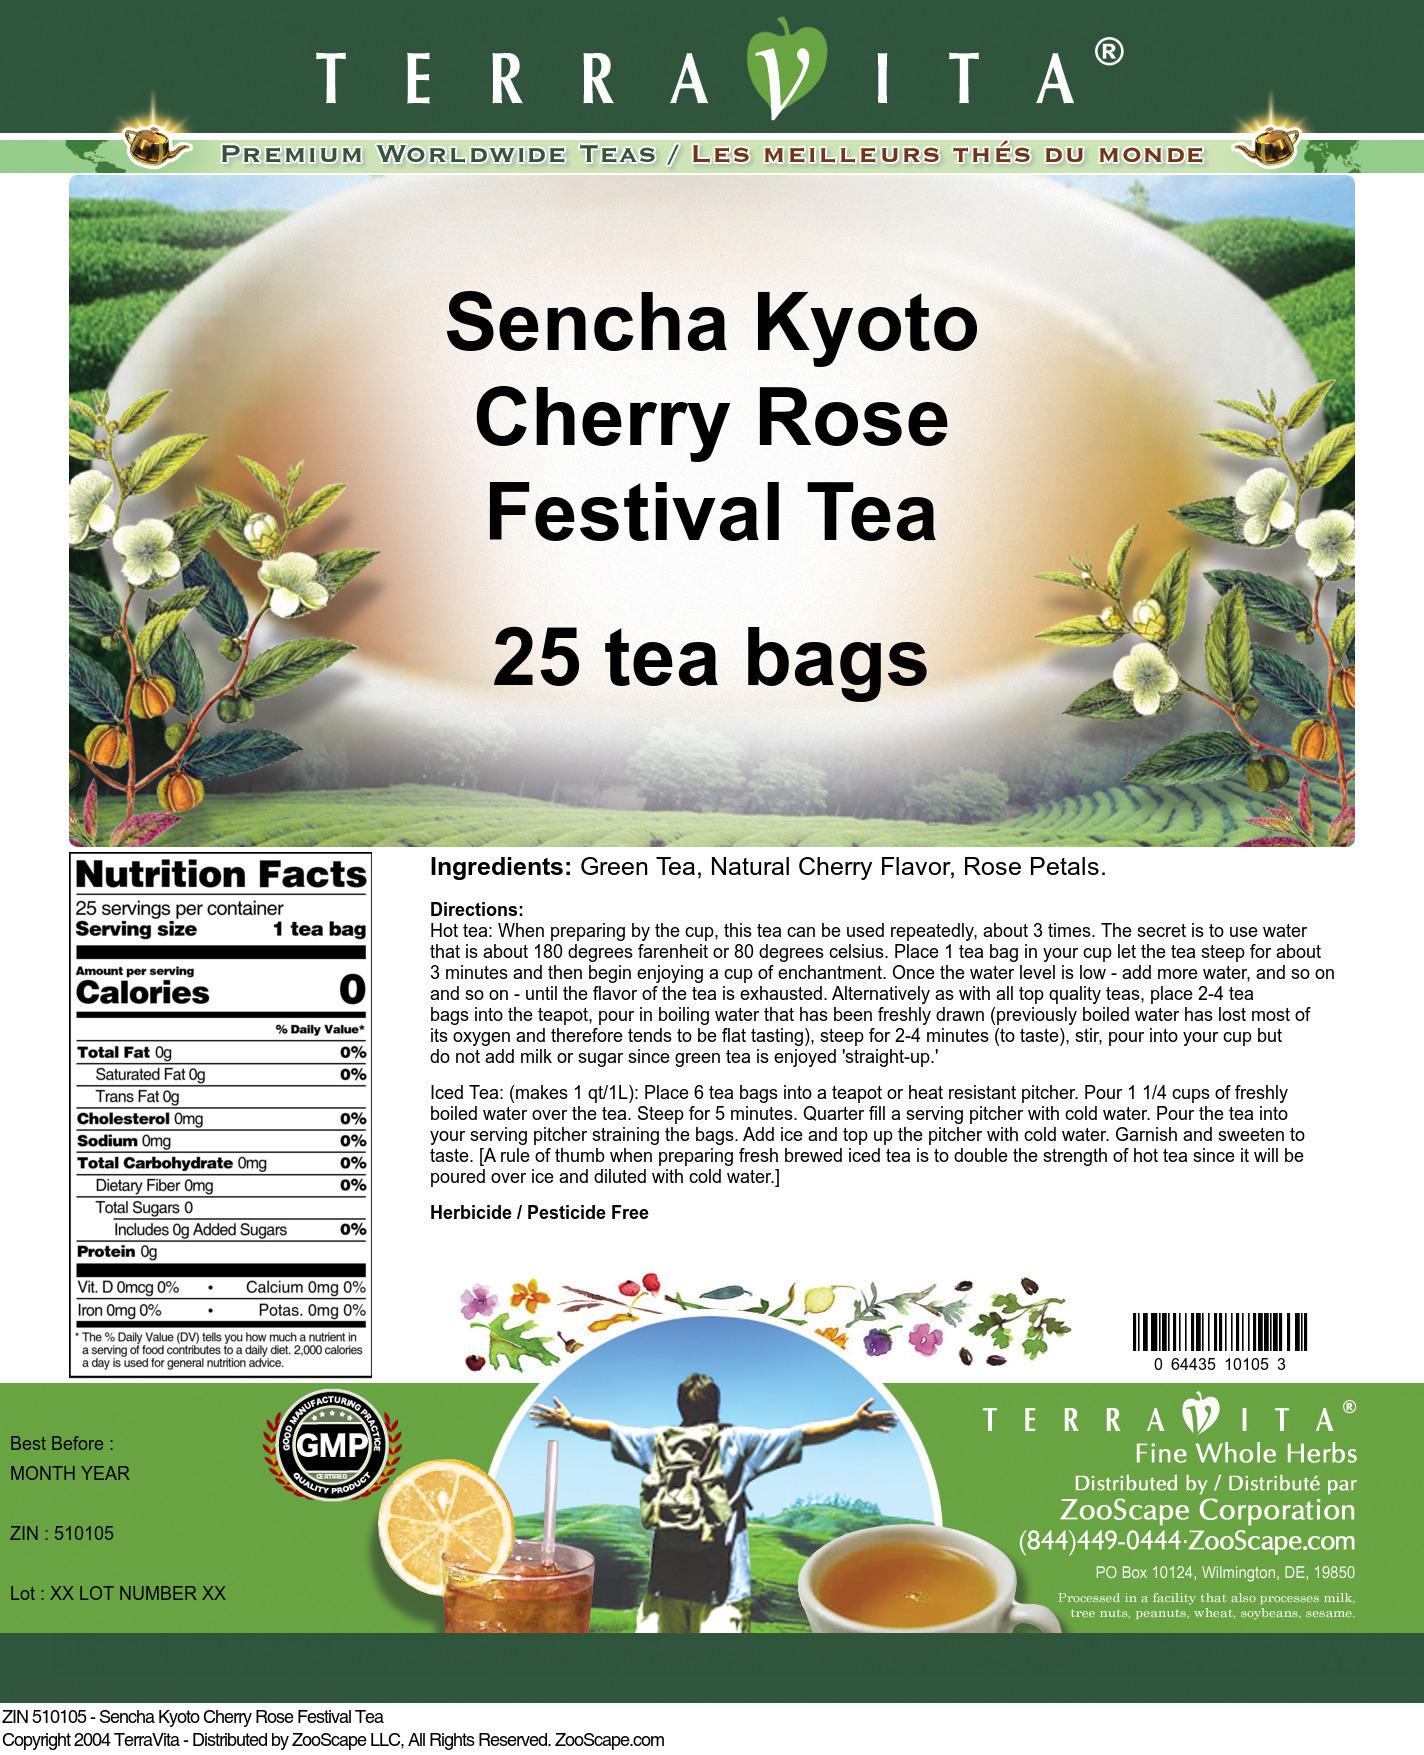 Sencha Kyoto Cherry Rose Festival Tea